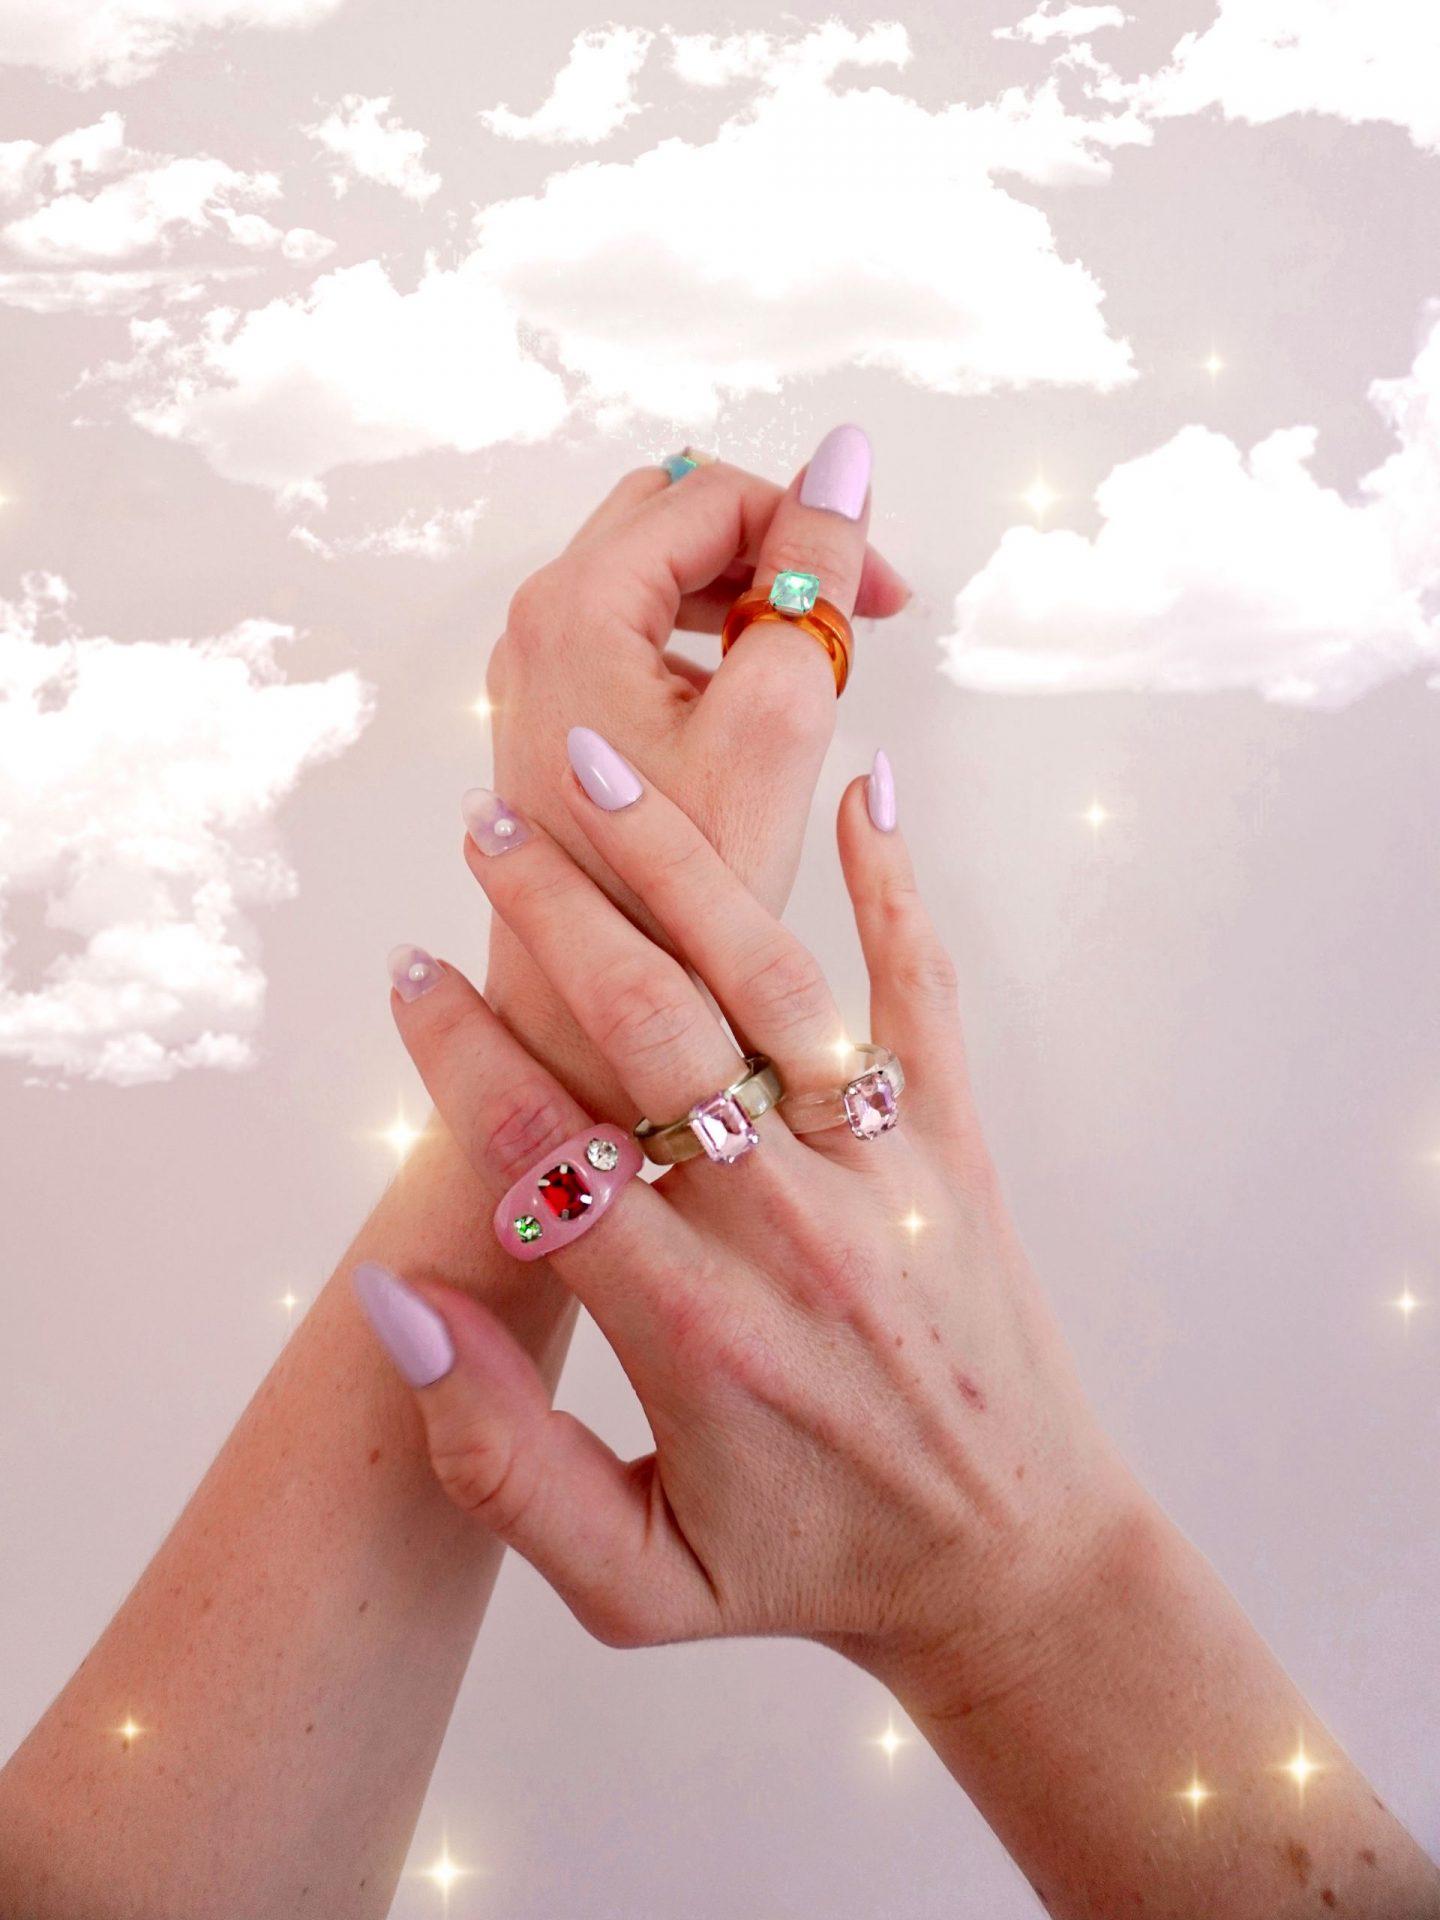 hands wearing amazon ring set celebs love them